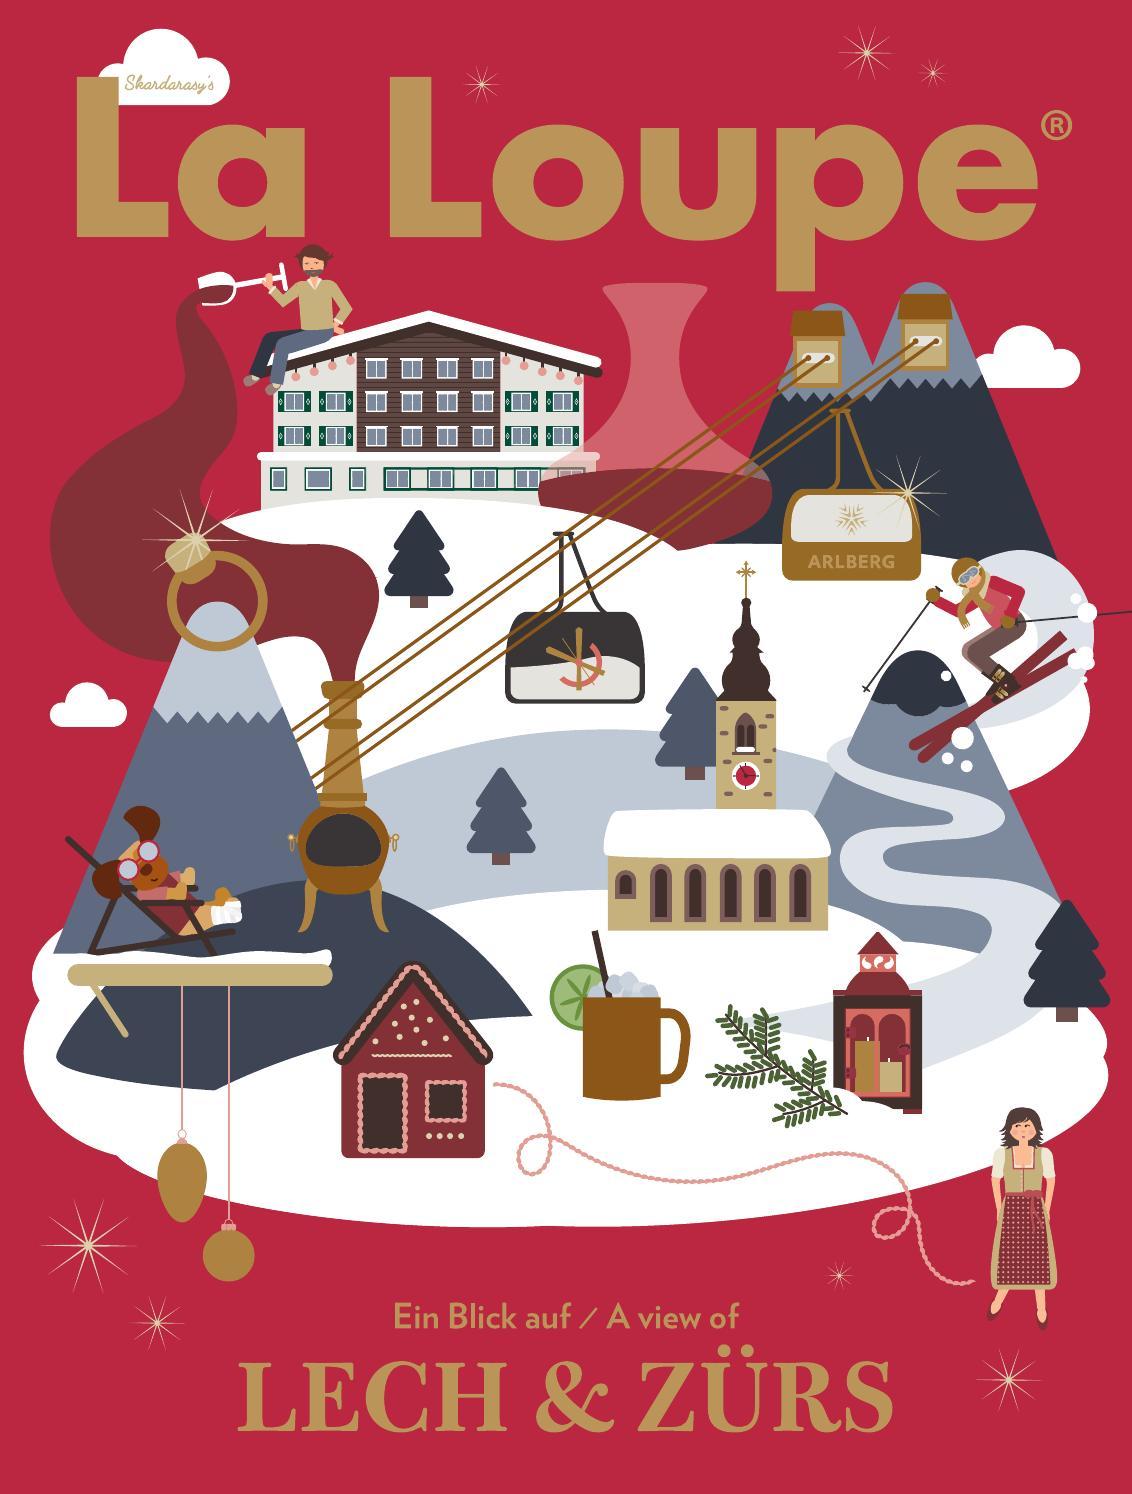 LA LOUPE Lech & Zürs Winter 2012/2013 by La Loupe.